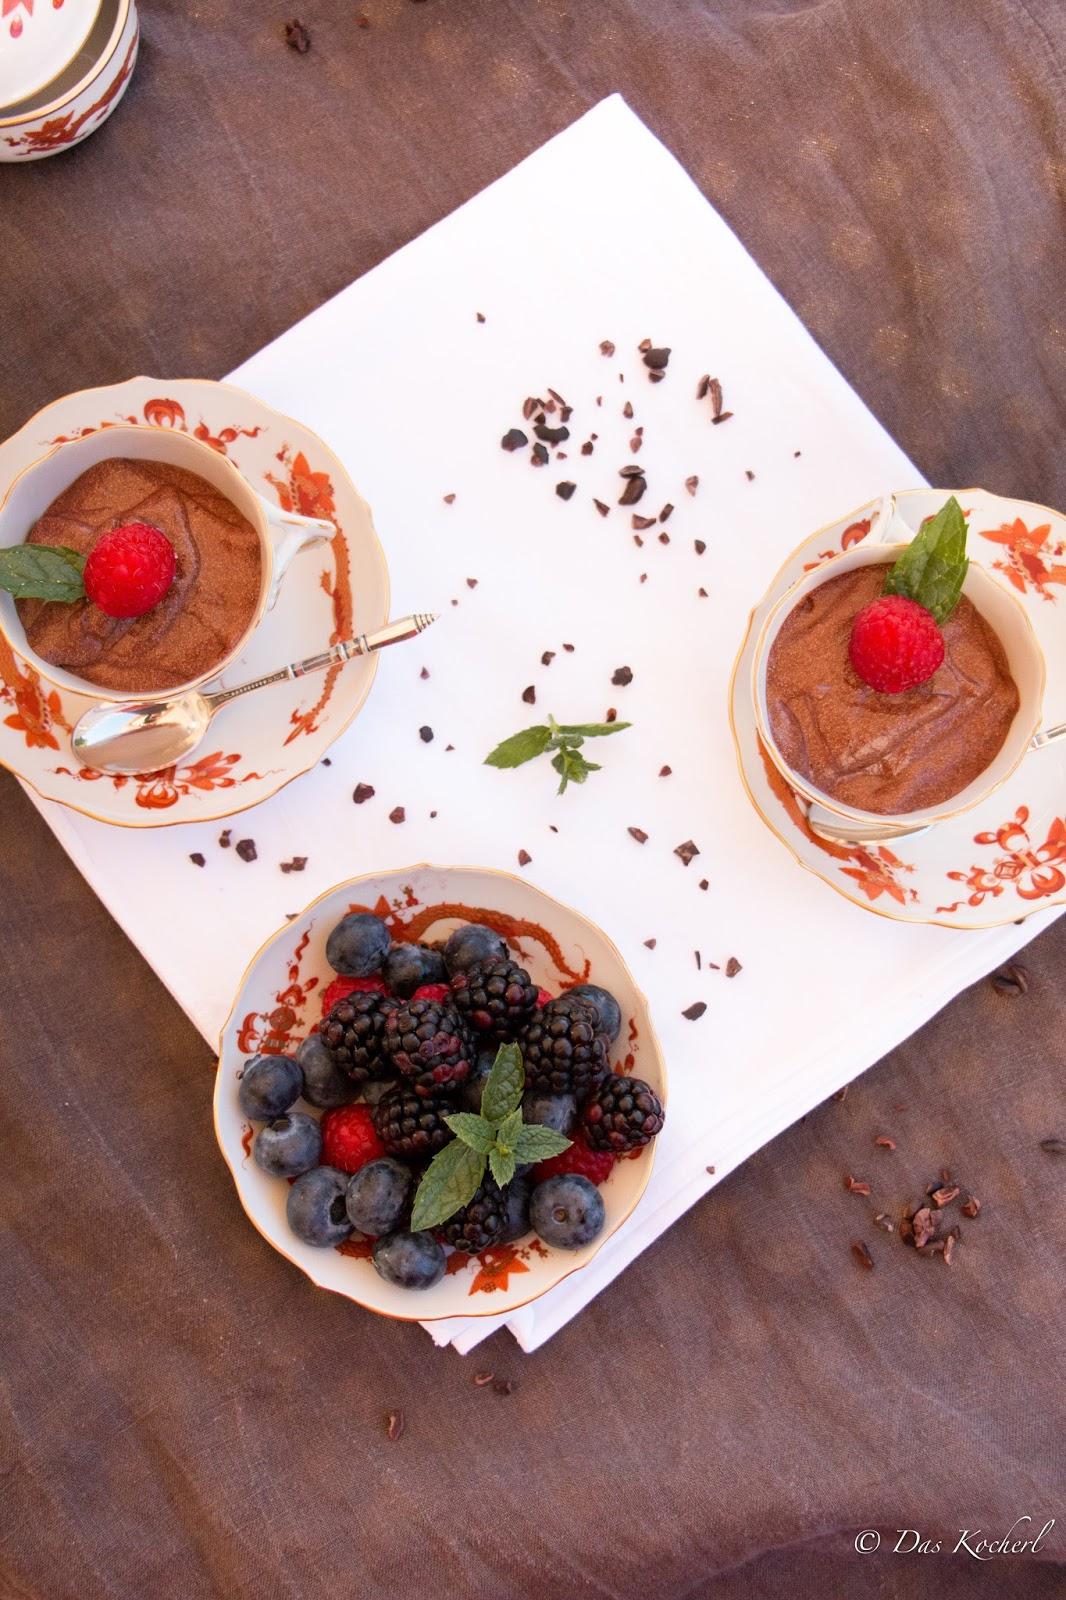 Mousse au Chocolat aus 2 Zutaten